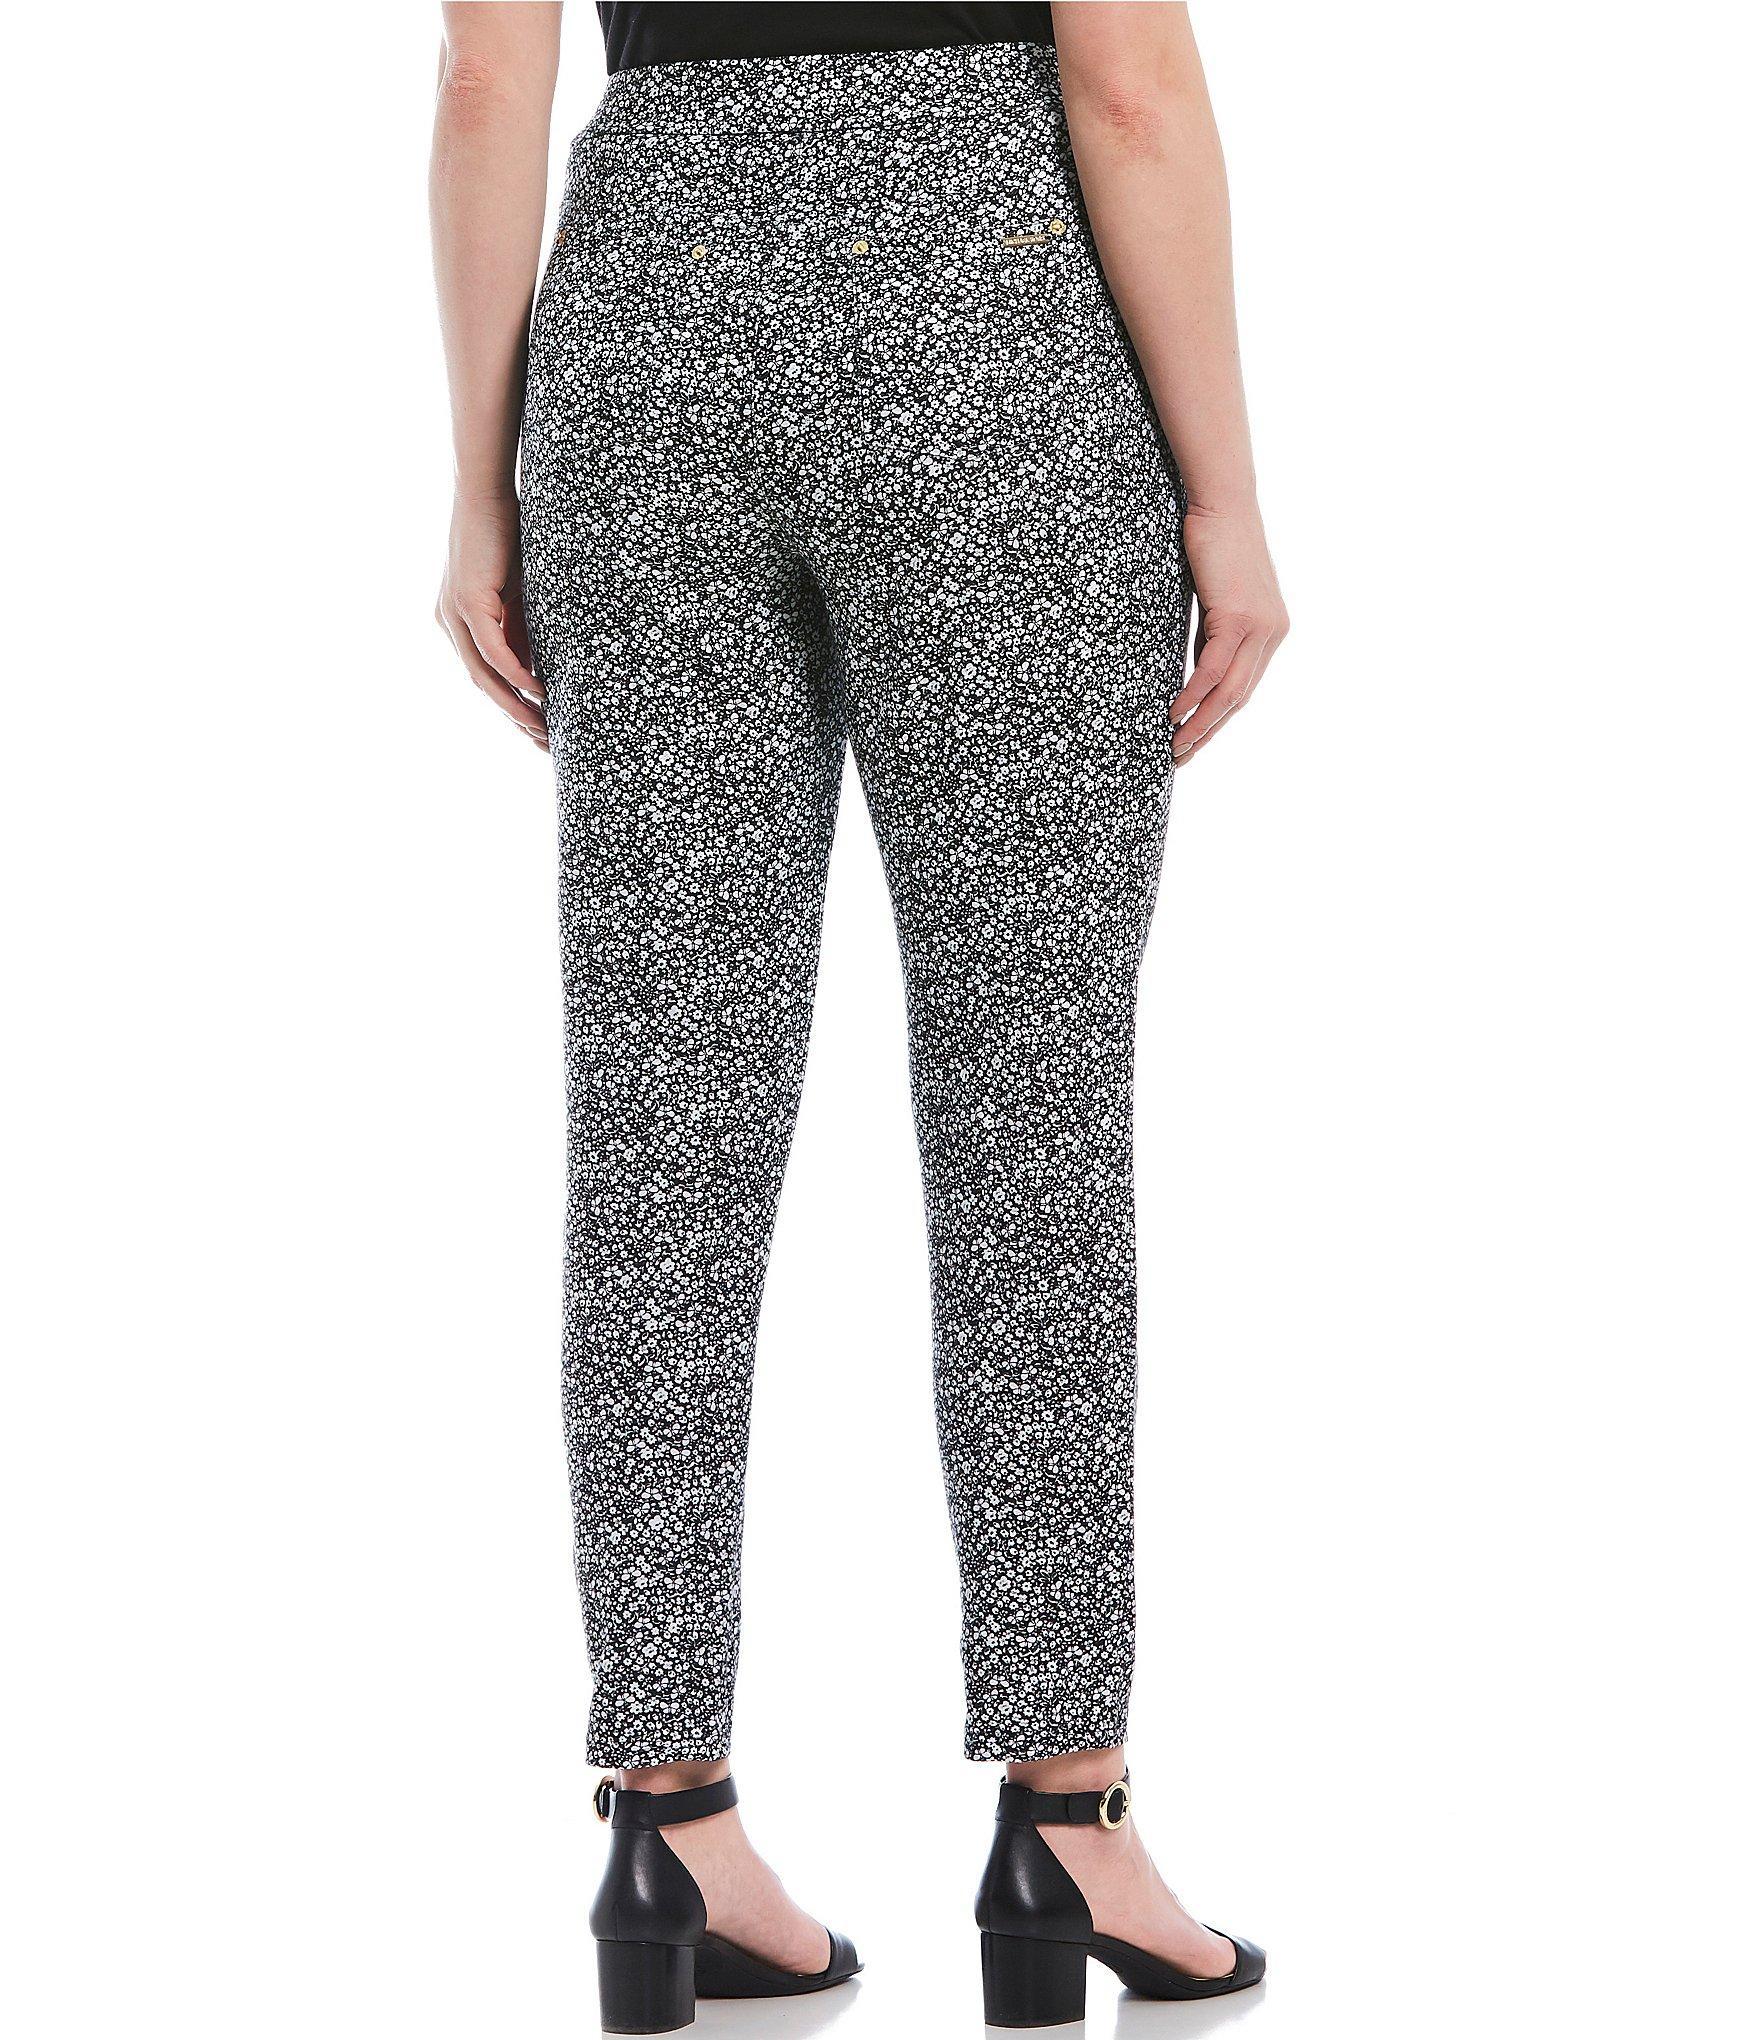 2531b5a55d1a8 MICHAEL Michael Kors - Black Plus Size Springtime Silhouette Print Stretch  Knit Twill Leggings - Lyst. View fullscreen